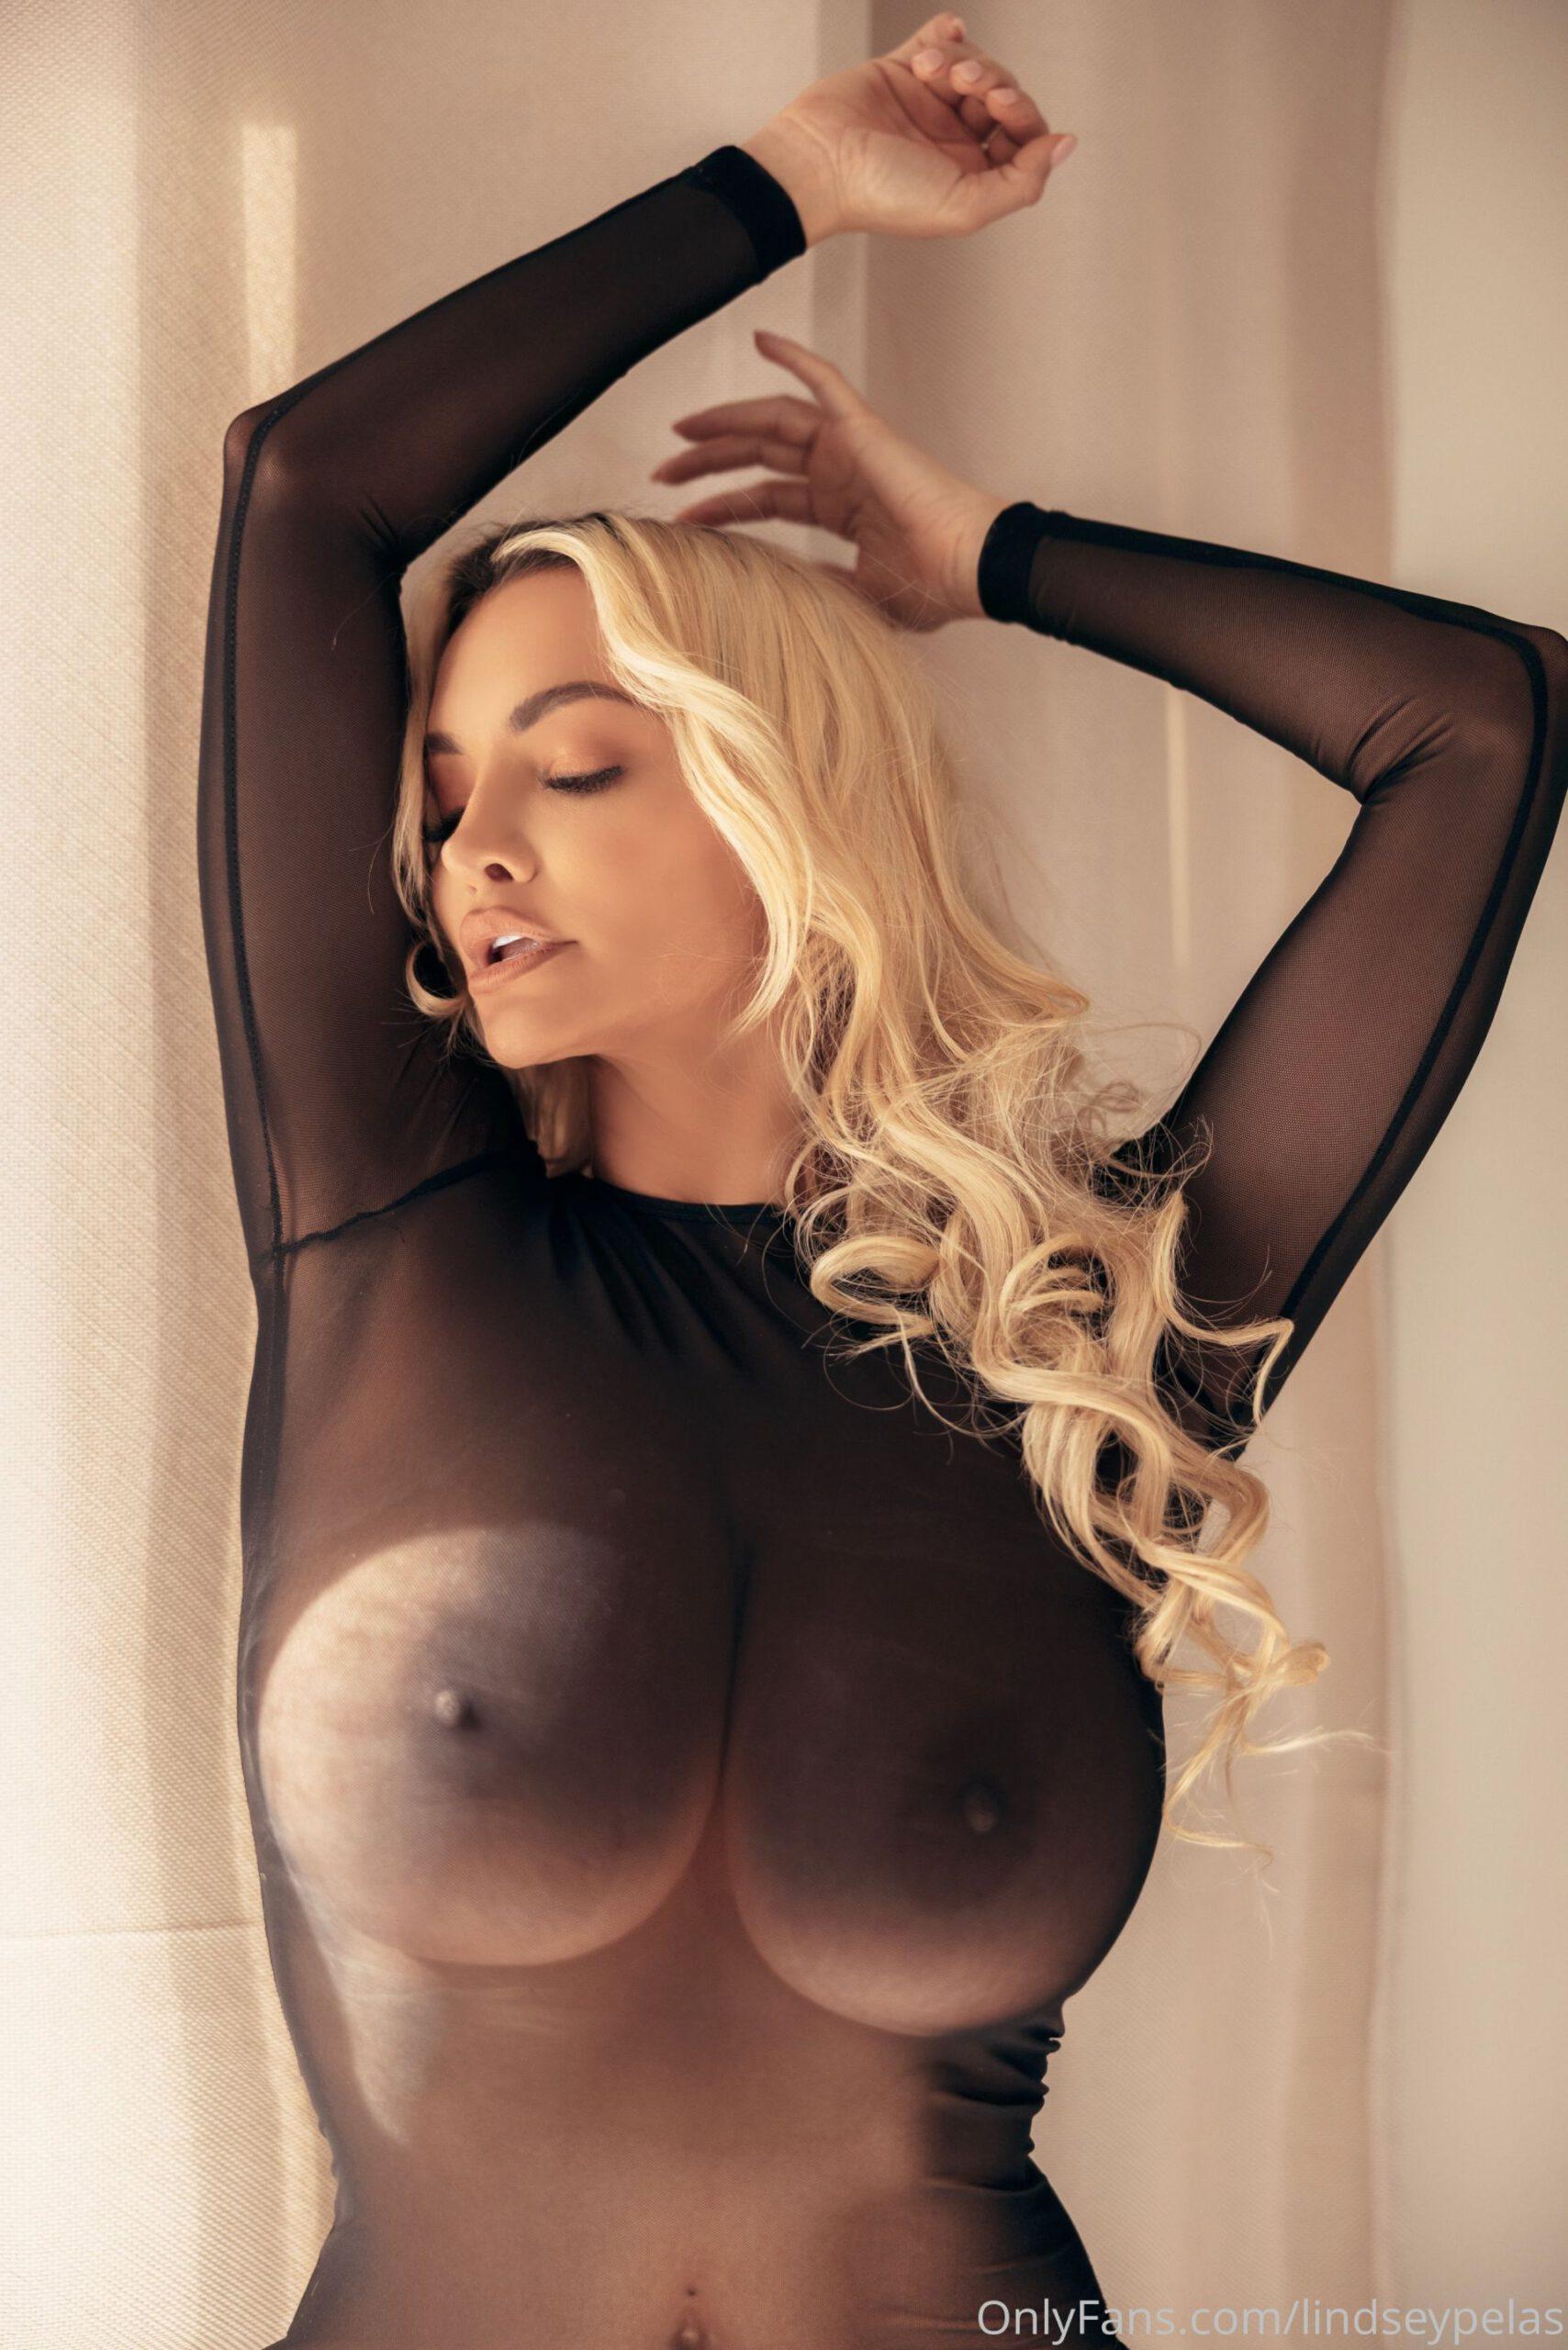 Tits lindsey pelas Lindsey Pelas